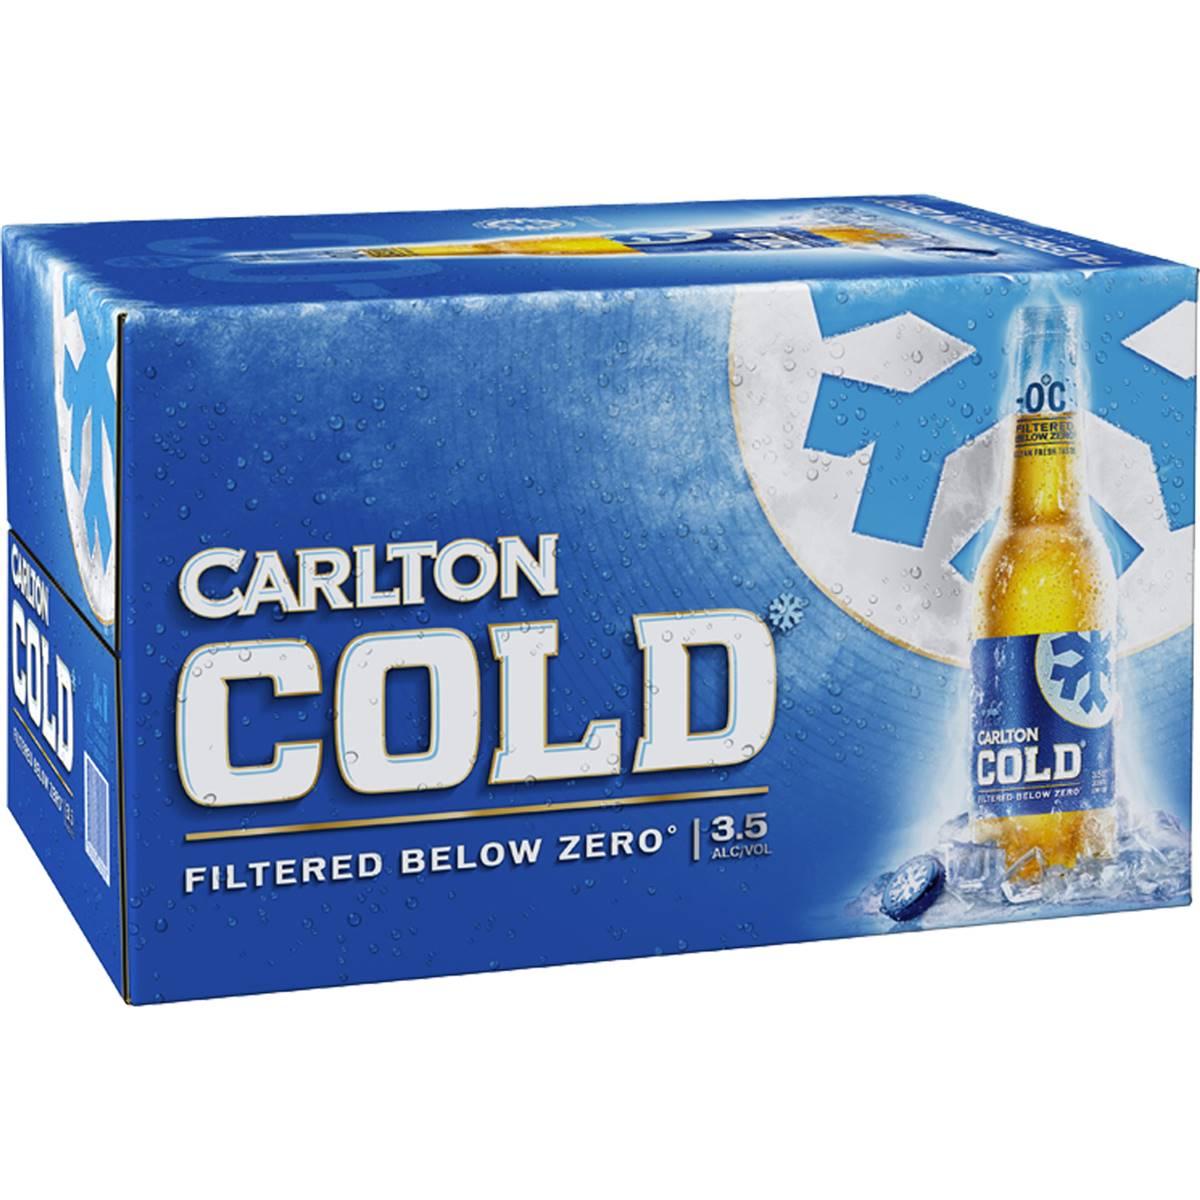 Carlton Cold Lager 3.5% Bottles